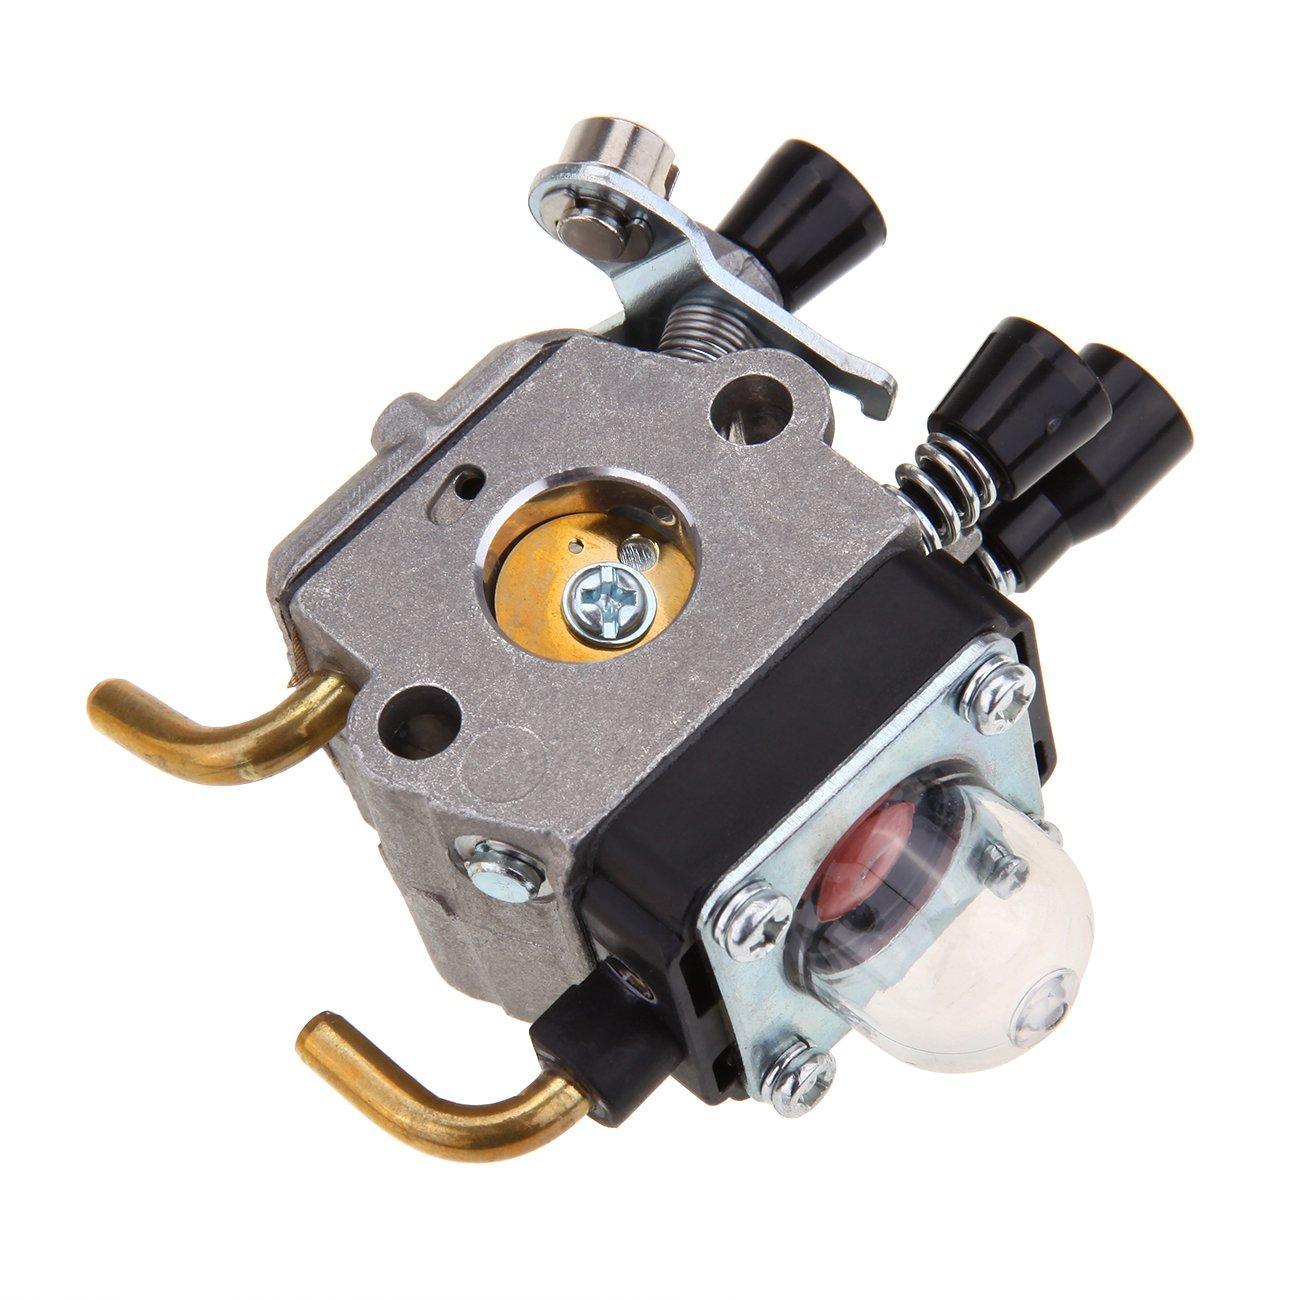 Amazon.com: Ridgeyard Carburetor Carb for STIHL FS38 FS45 ...